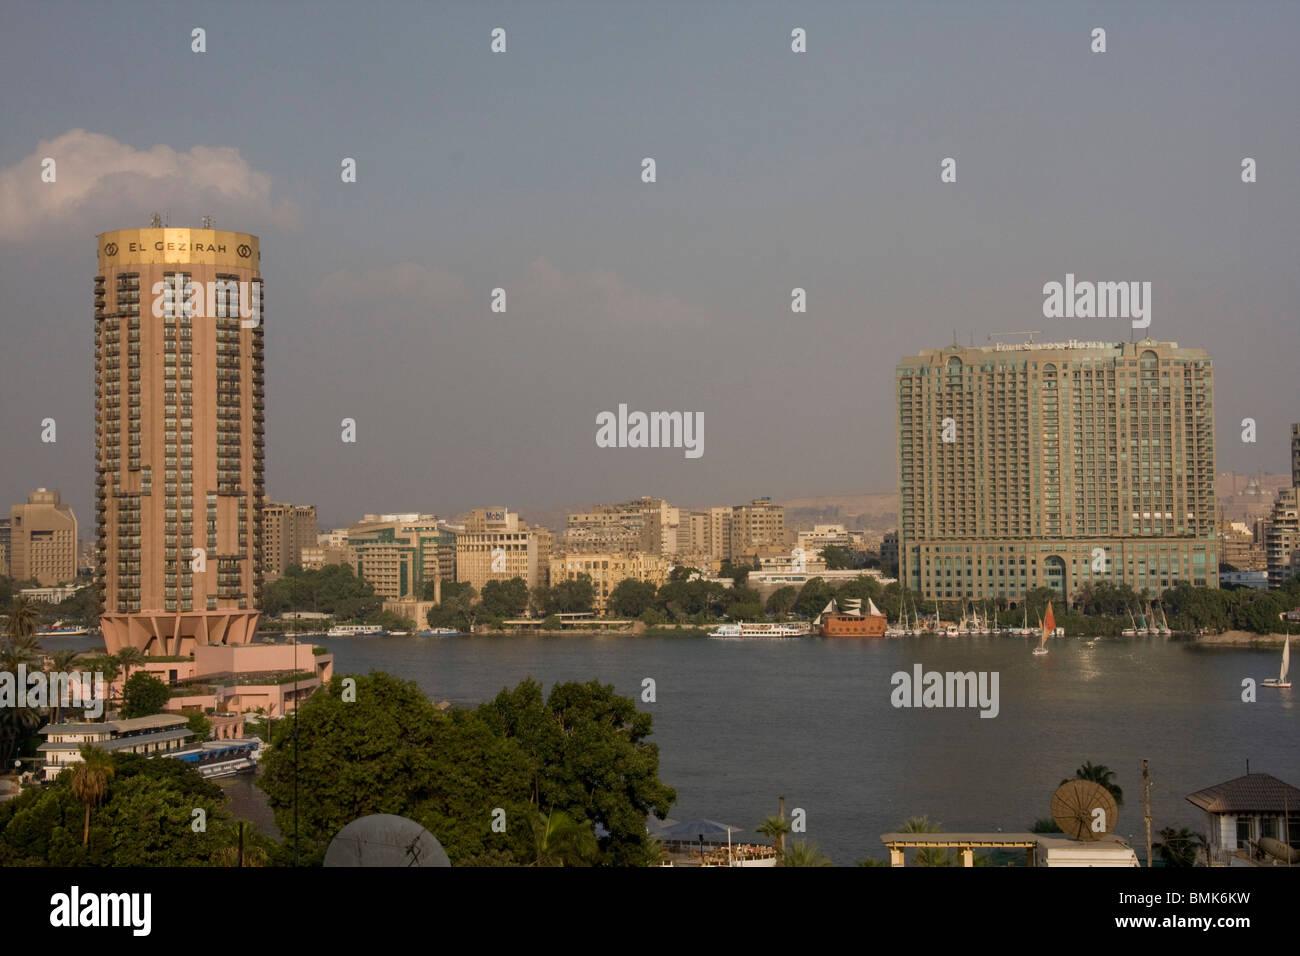 El Gezirah Hotel and Four Seasons Hotel along the Nile River, Cairo, Al Qahirah, Egypt Stock Photo